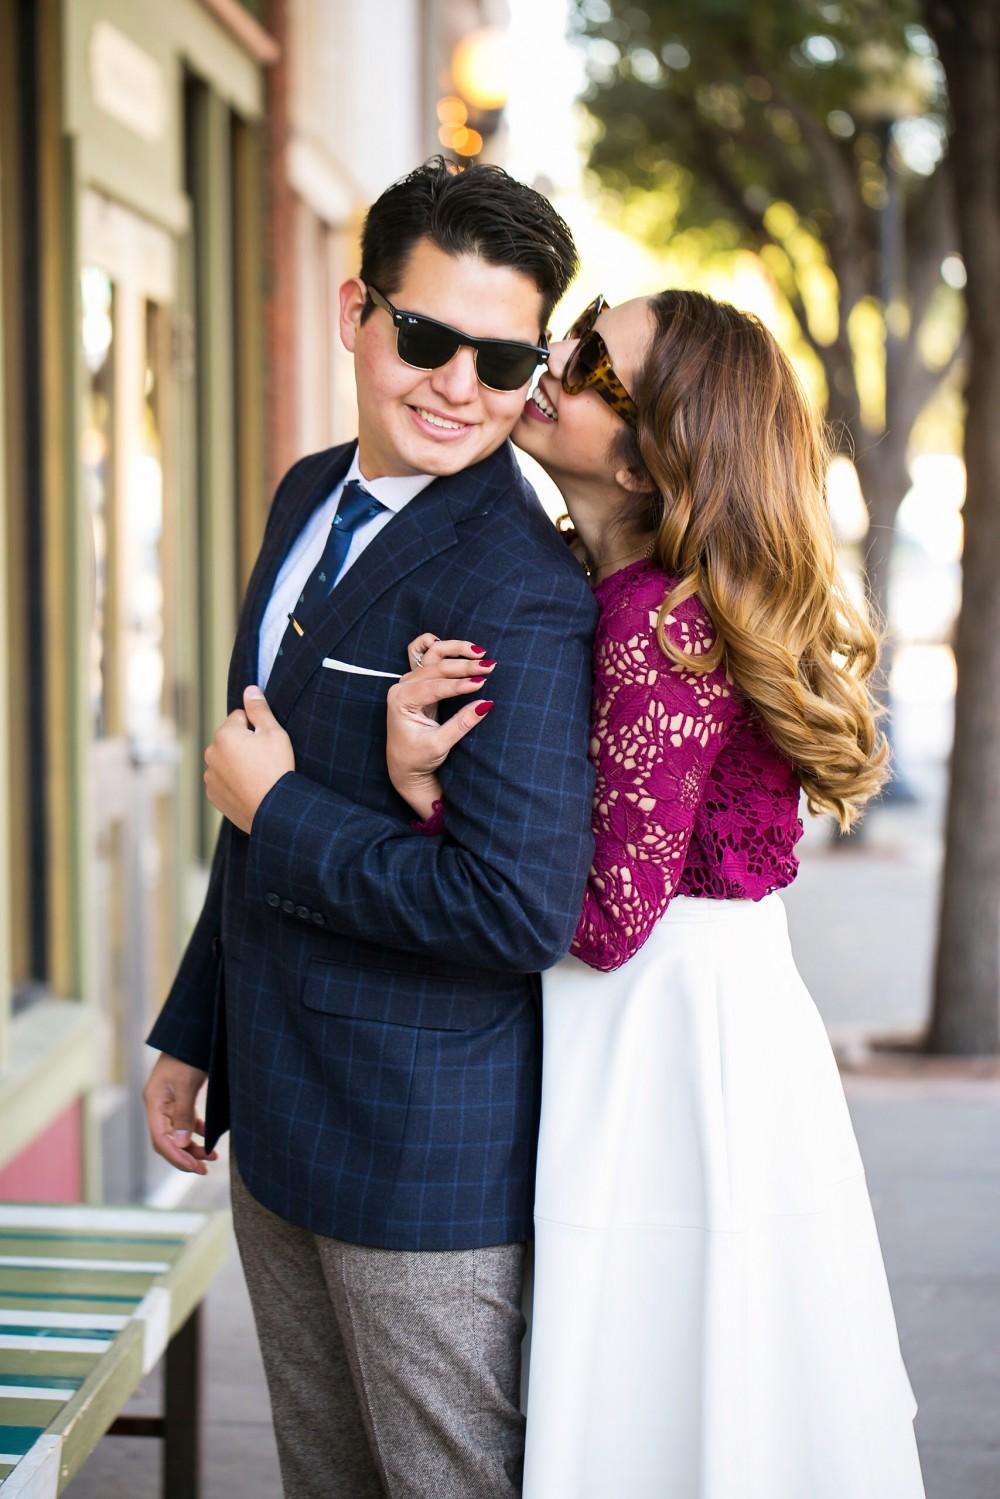 Image 1 of Cynthia and Ricardo